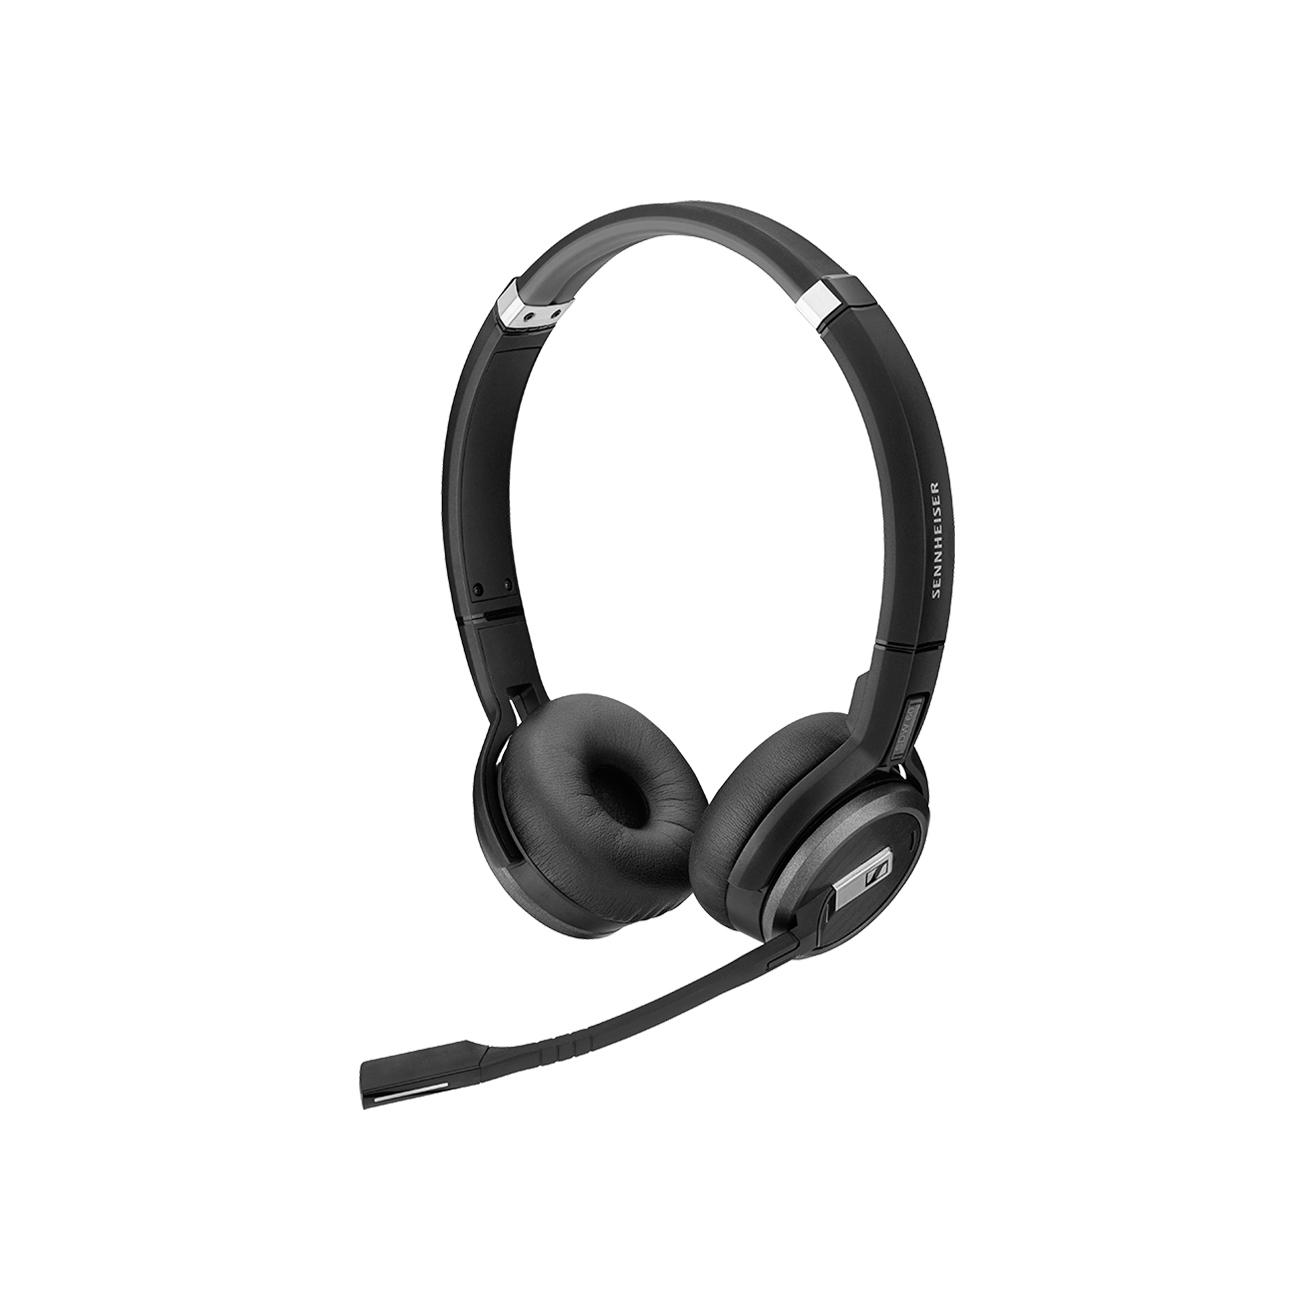 Sennheiser SDW 5063 Headset Head-band Black